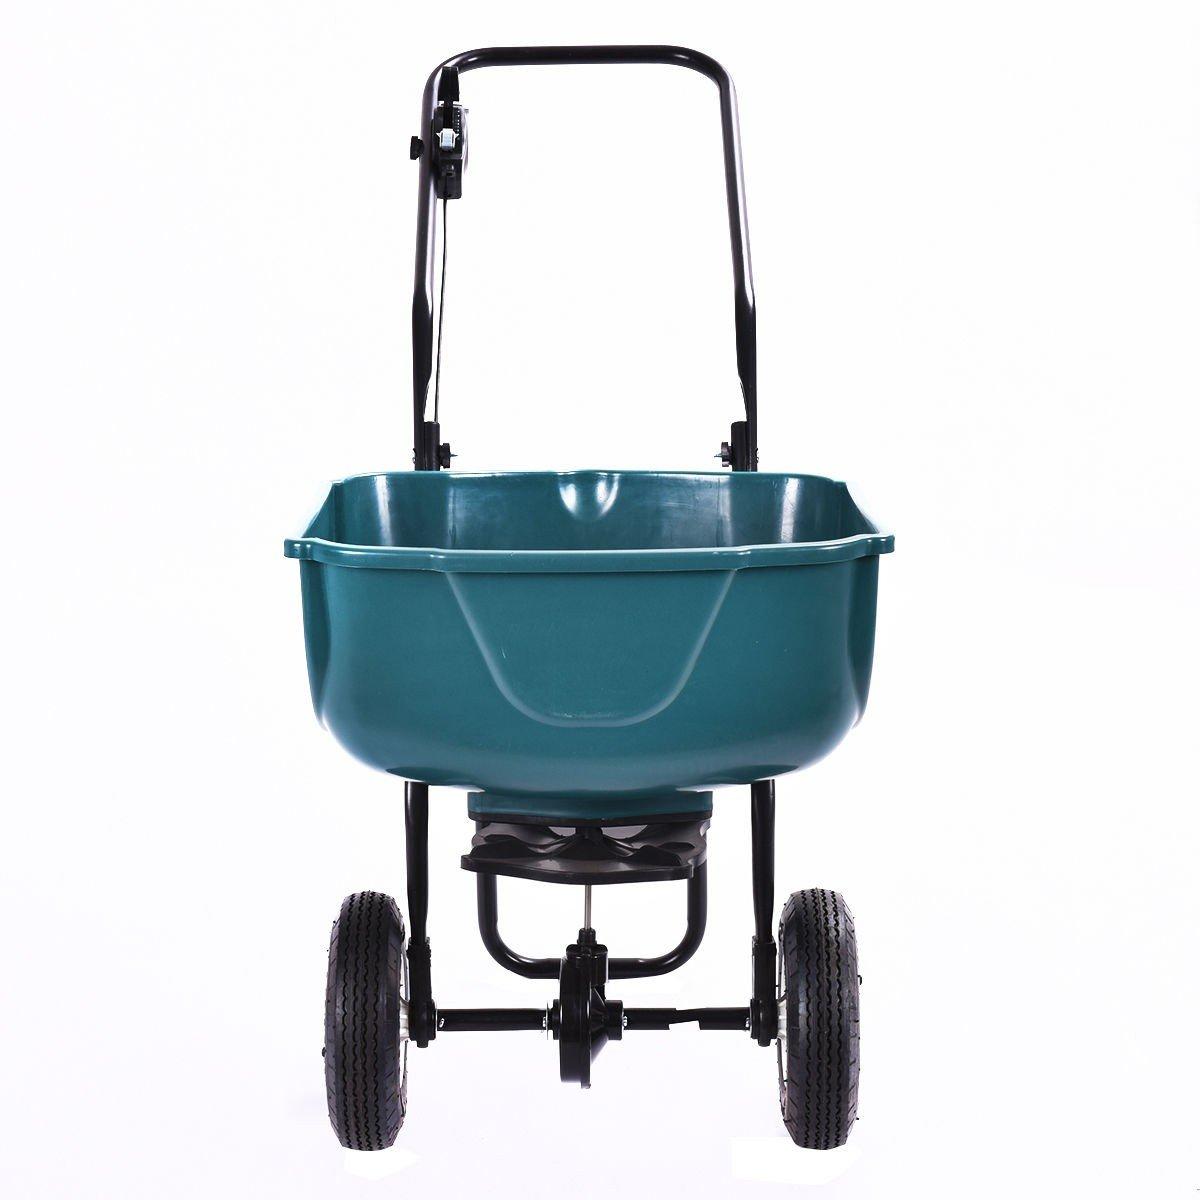 MD Group Spreader Fertilizer Seed Grass Broadcast Push Cart Wheeled Gardening Lawn Equipment